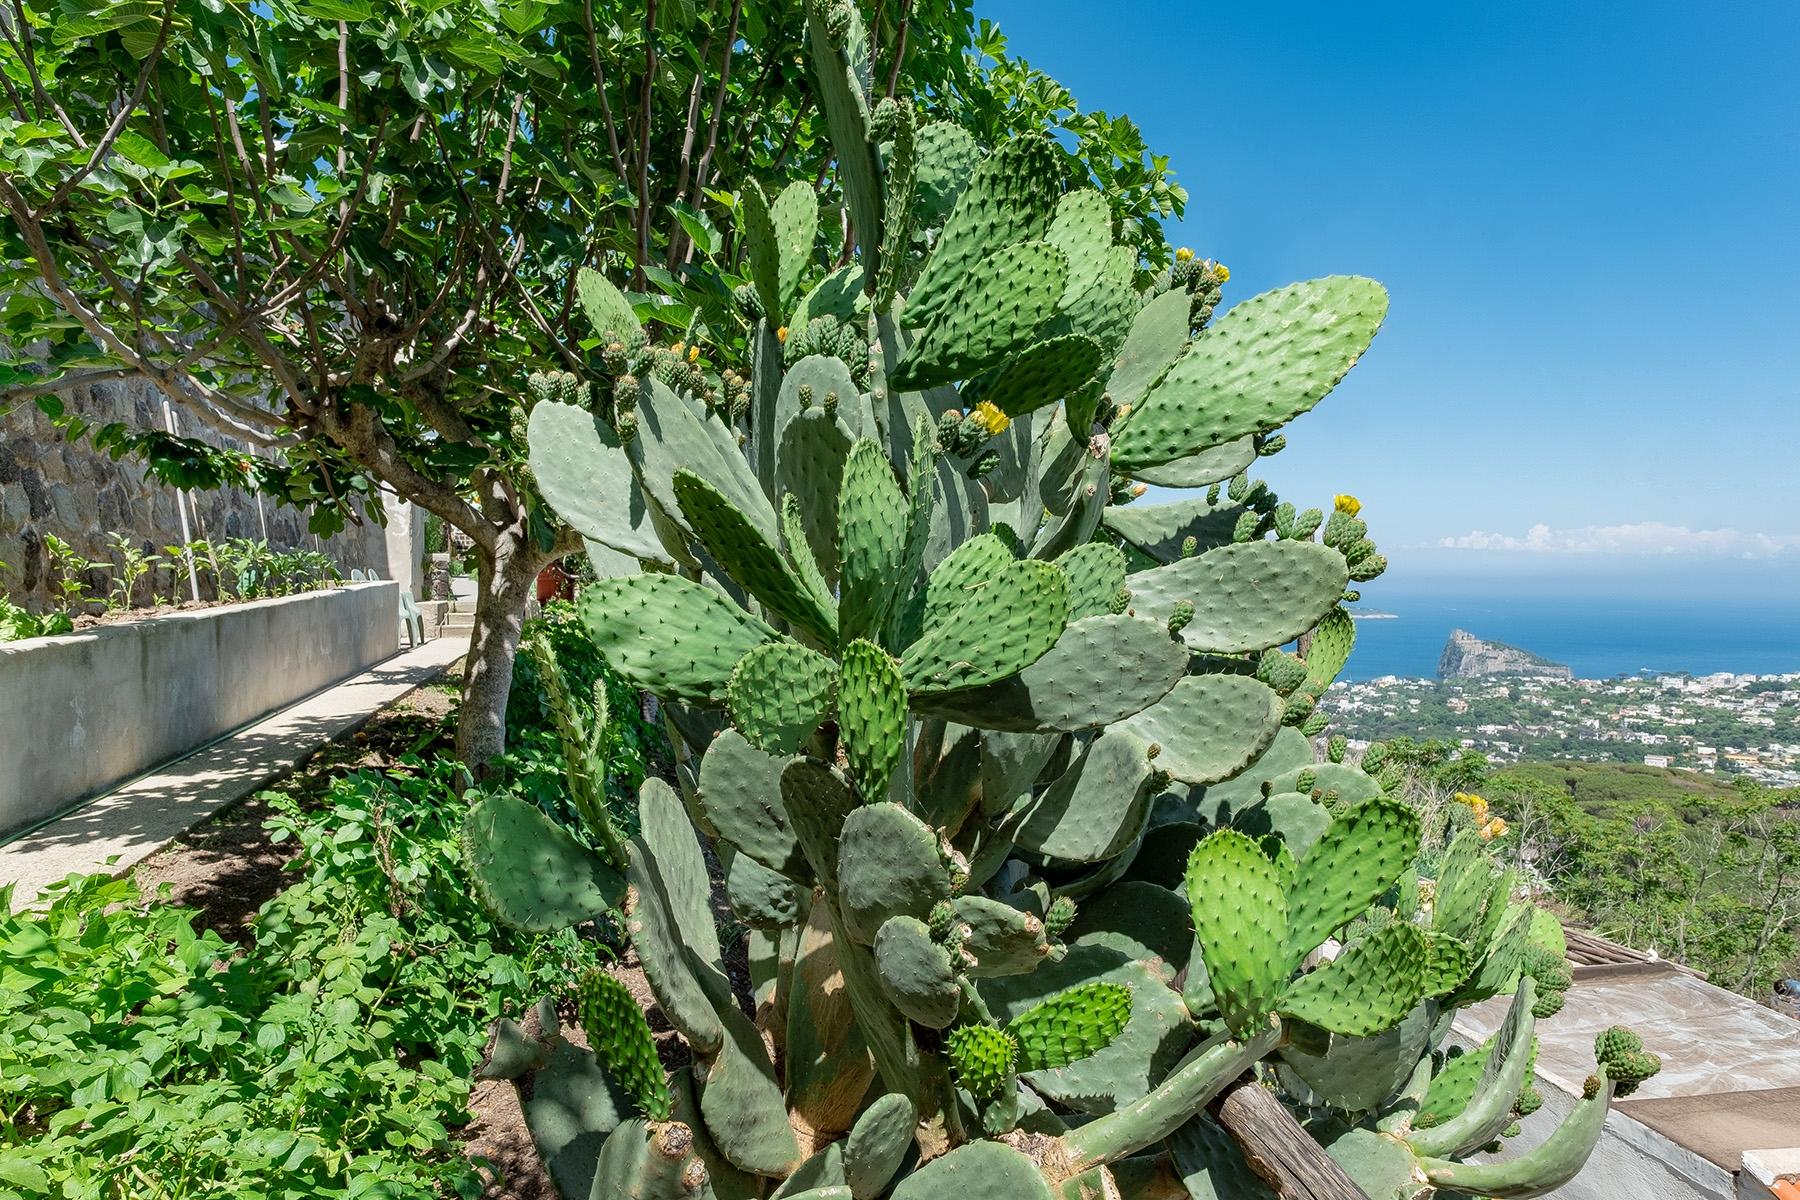 Villa in Vendita a Ischia: 5 locali, 138 mq - Foto 11